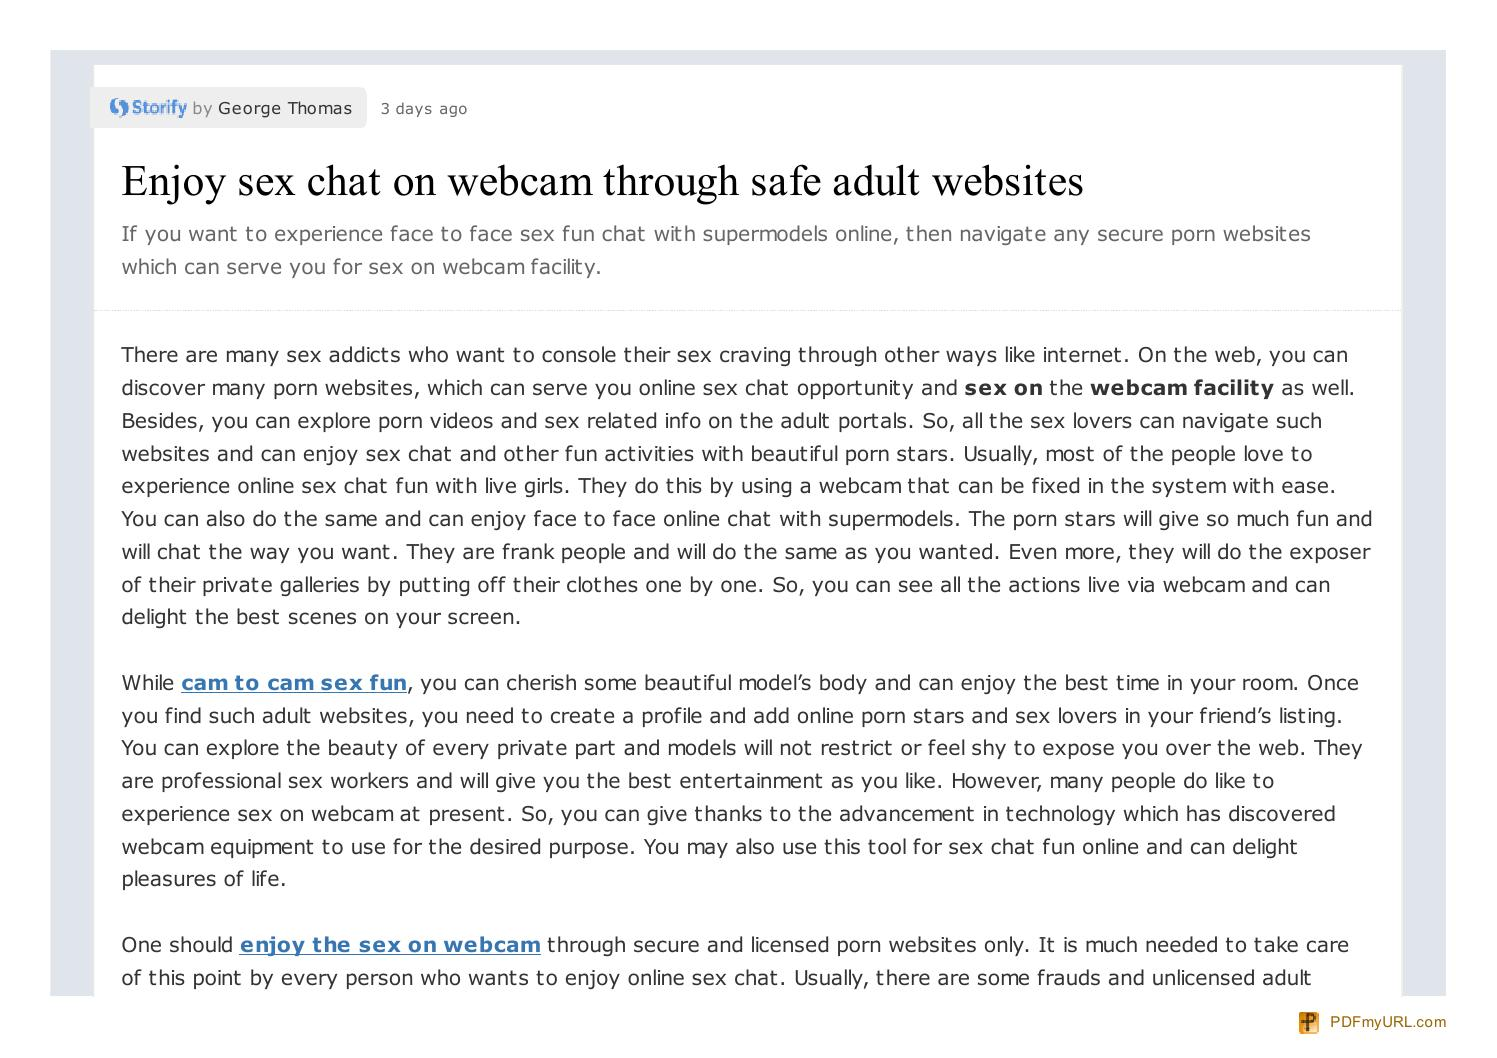 Safest adult sites